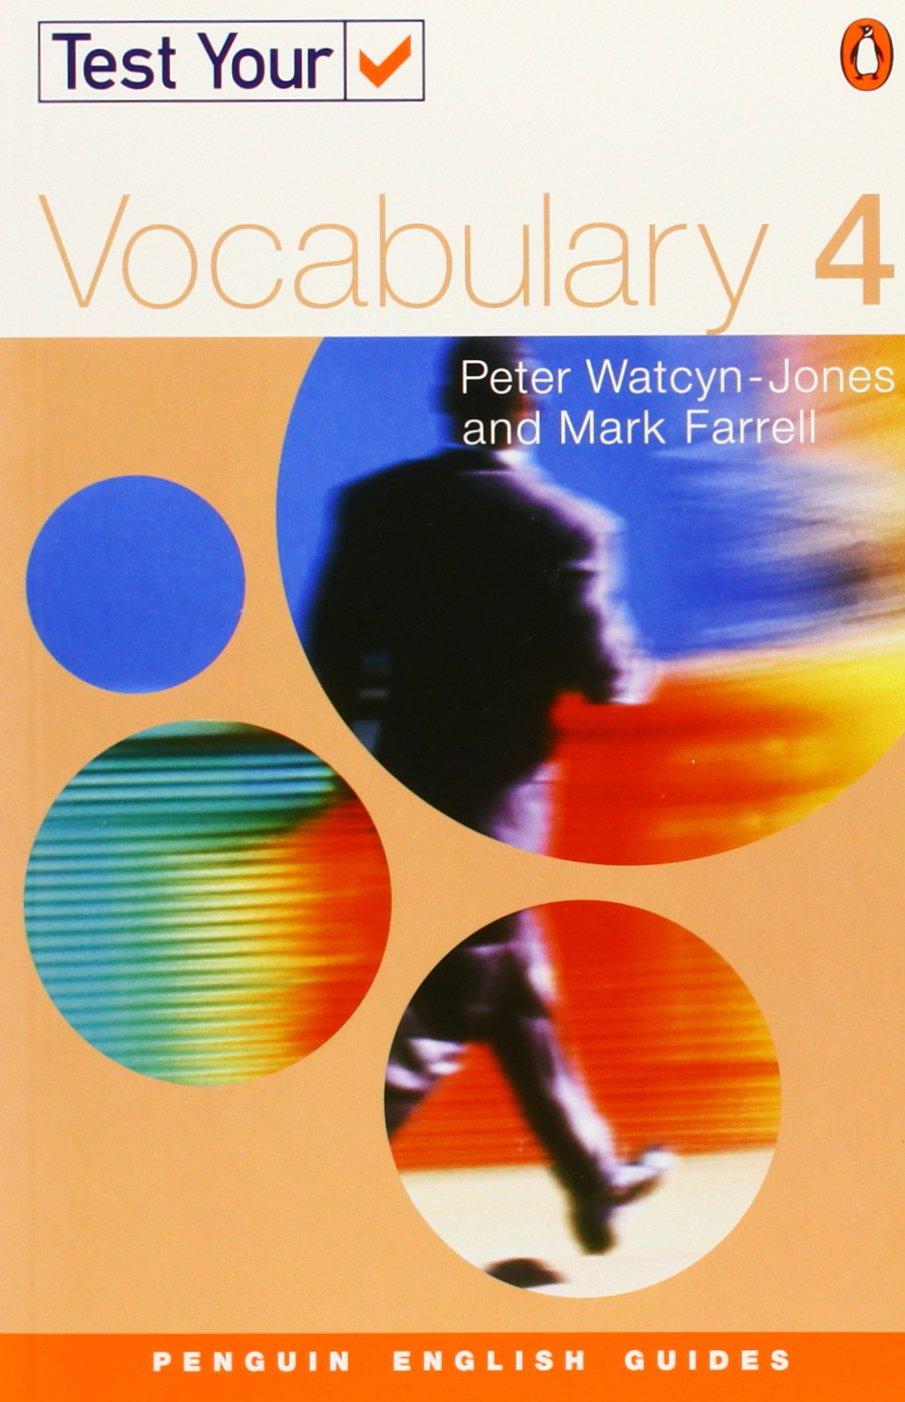 Test your vocabulary 4 ne penguin english amazon co uk peter watcyn jones mark farrell 9780582451698 books